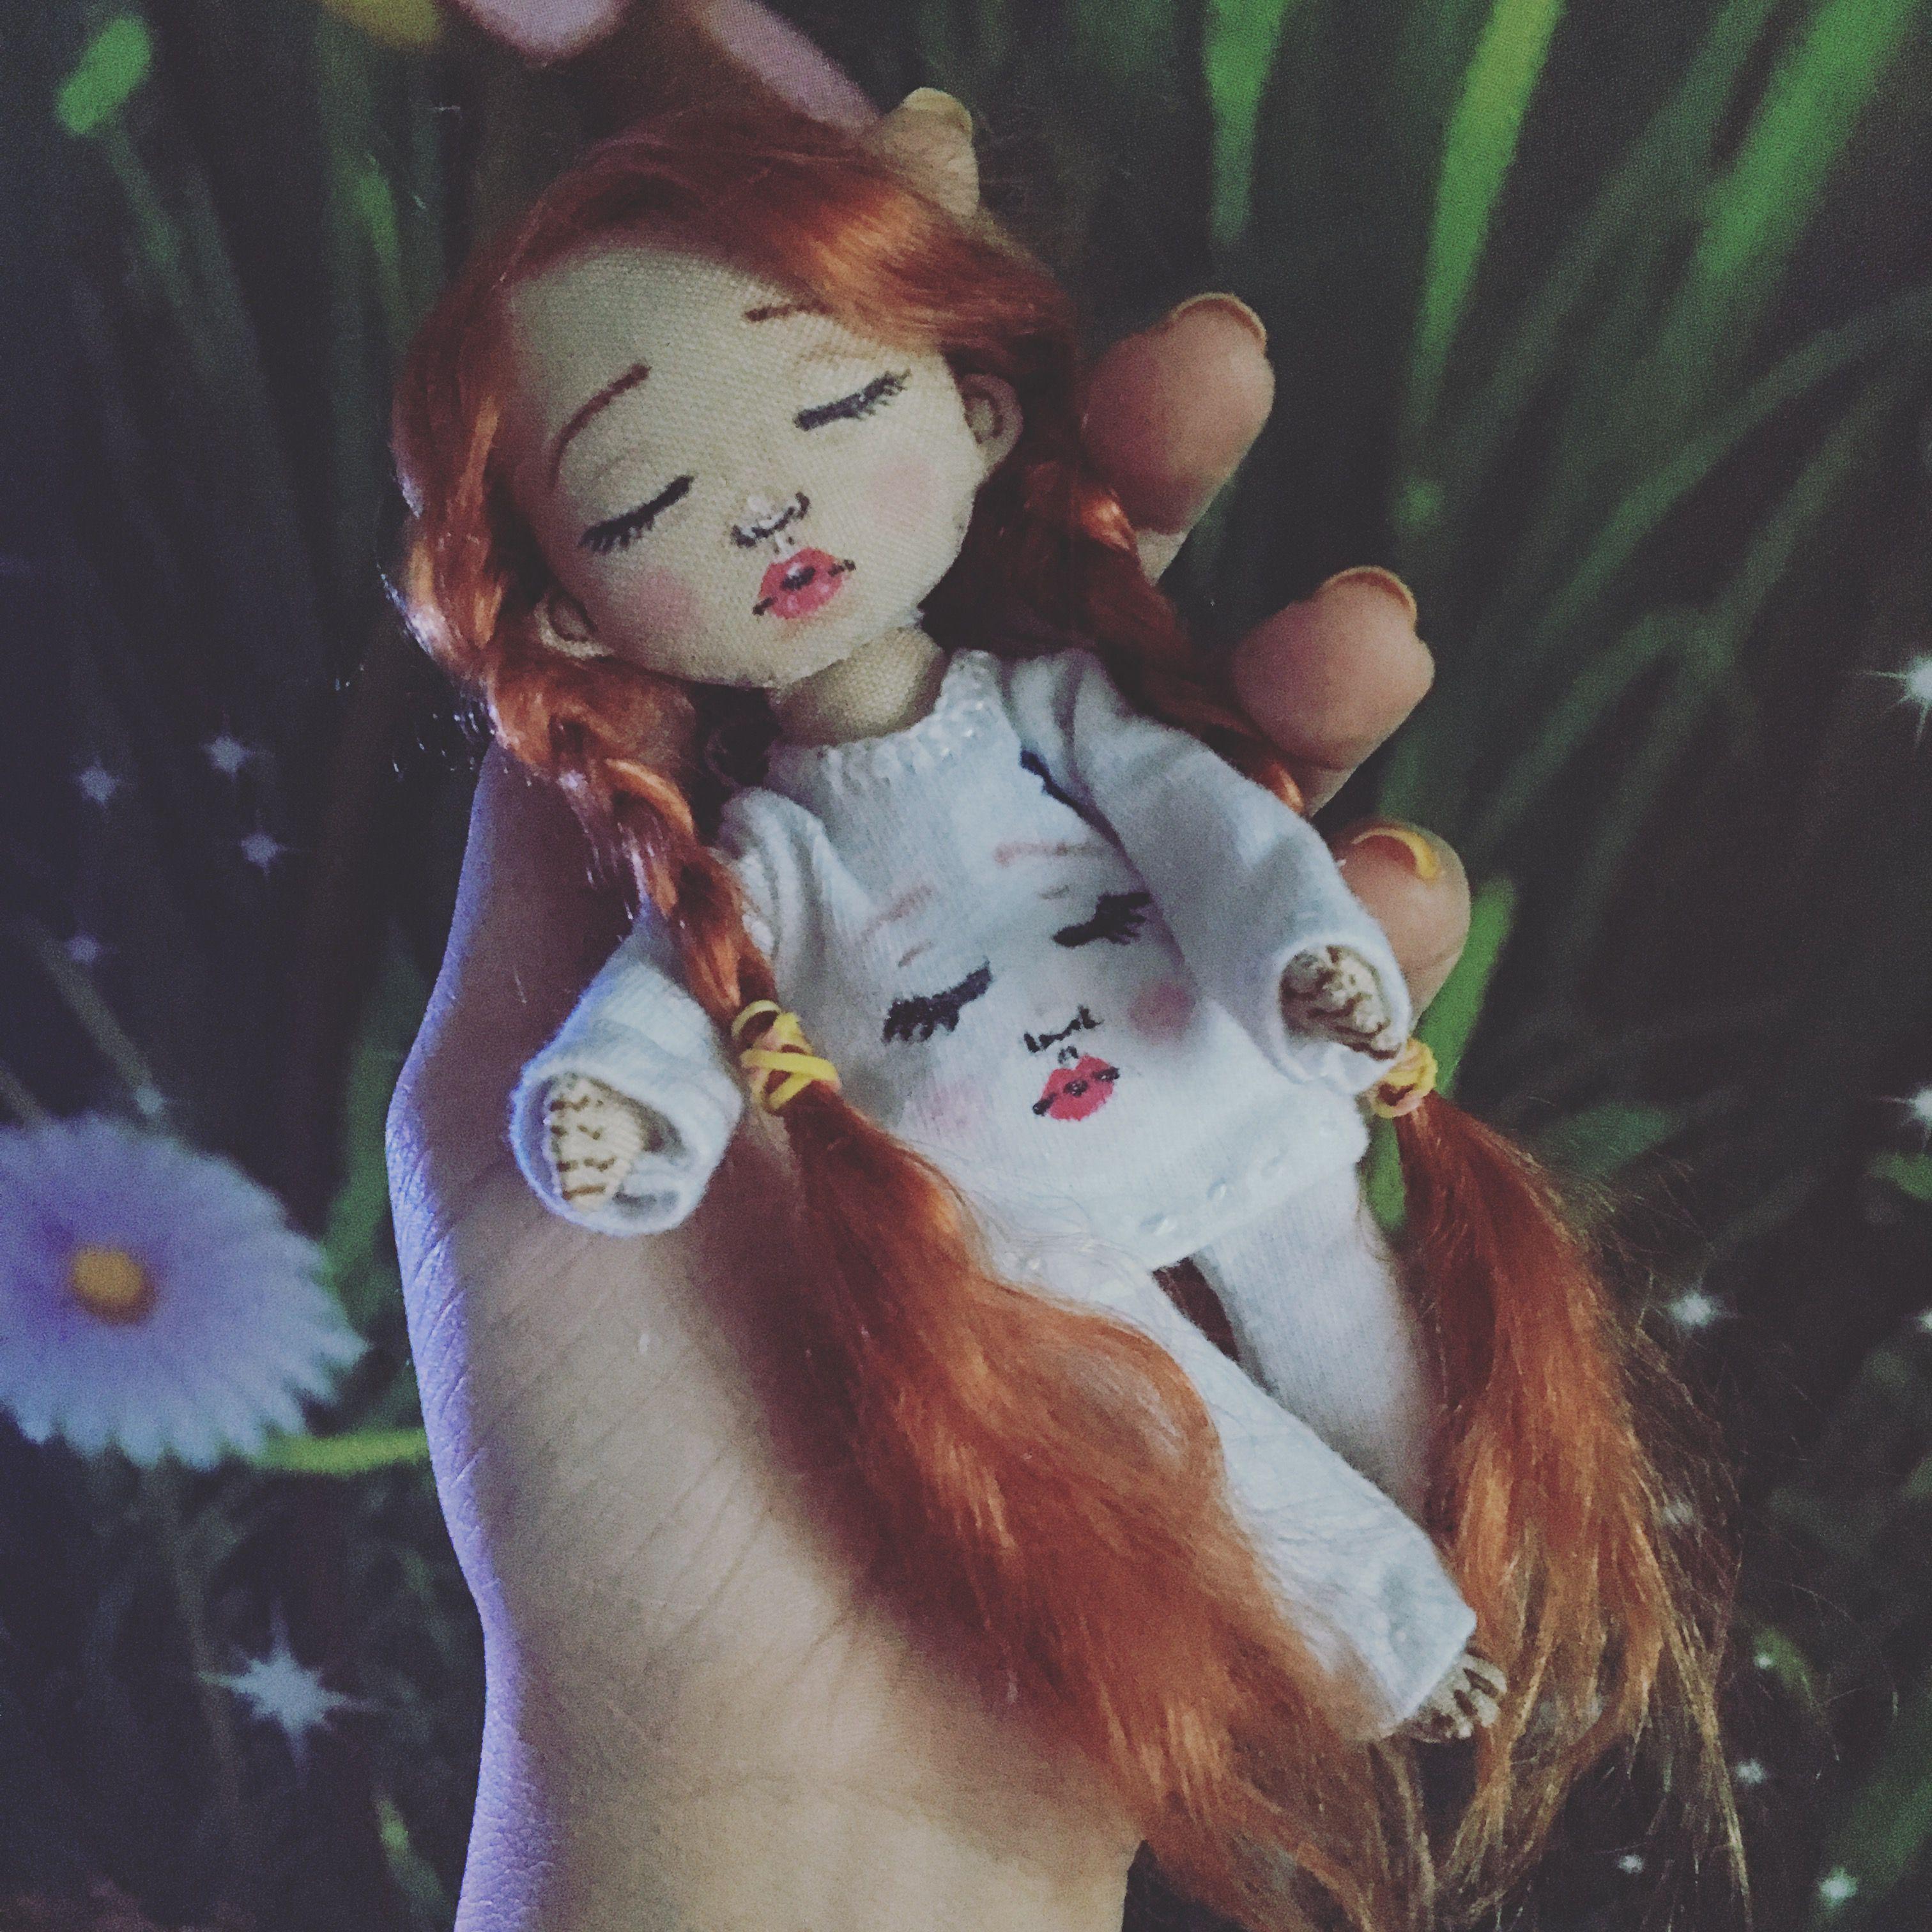 doll dolls куколкаручнойработы textiledoll кукла хендмейд куклавподарок handmade куколка handmadedoll куклаизткани подарок интерьернаякукла подарки